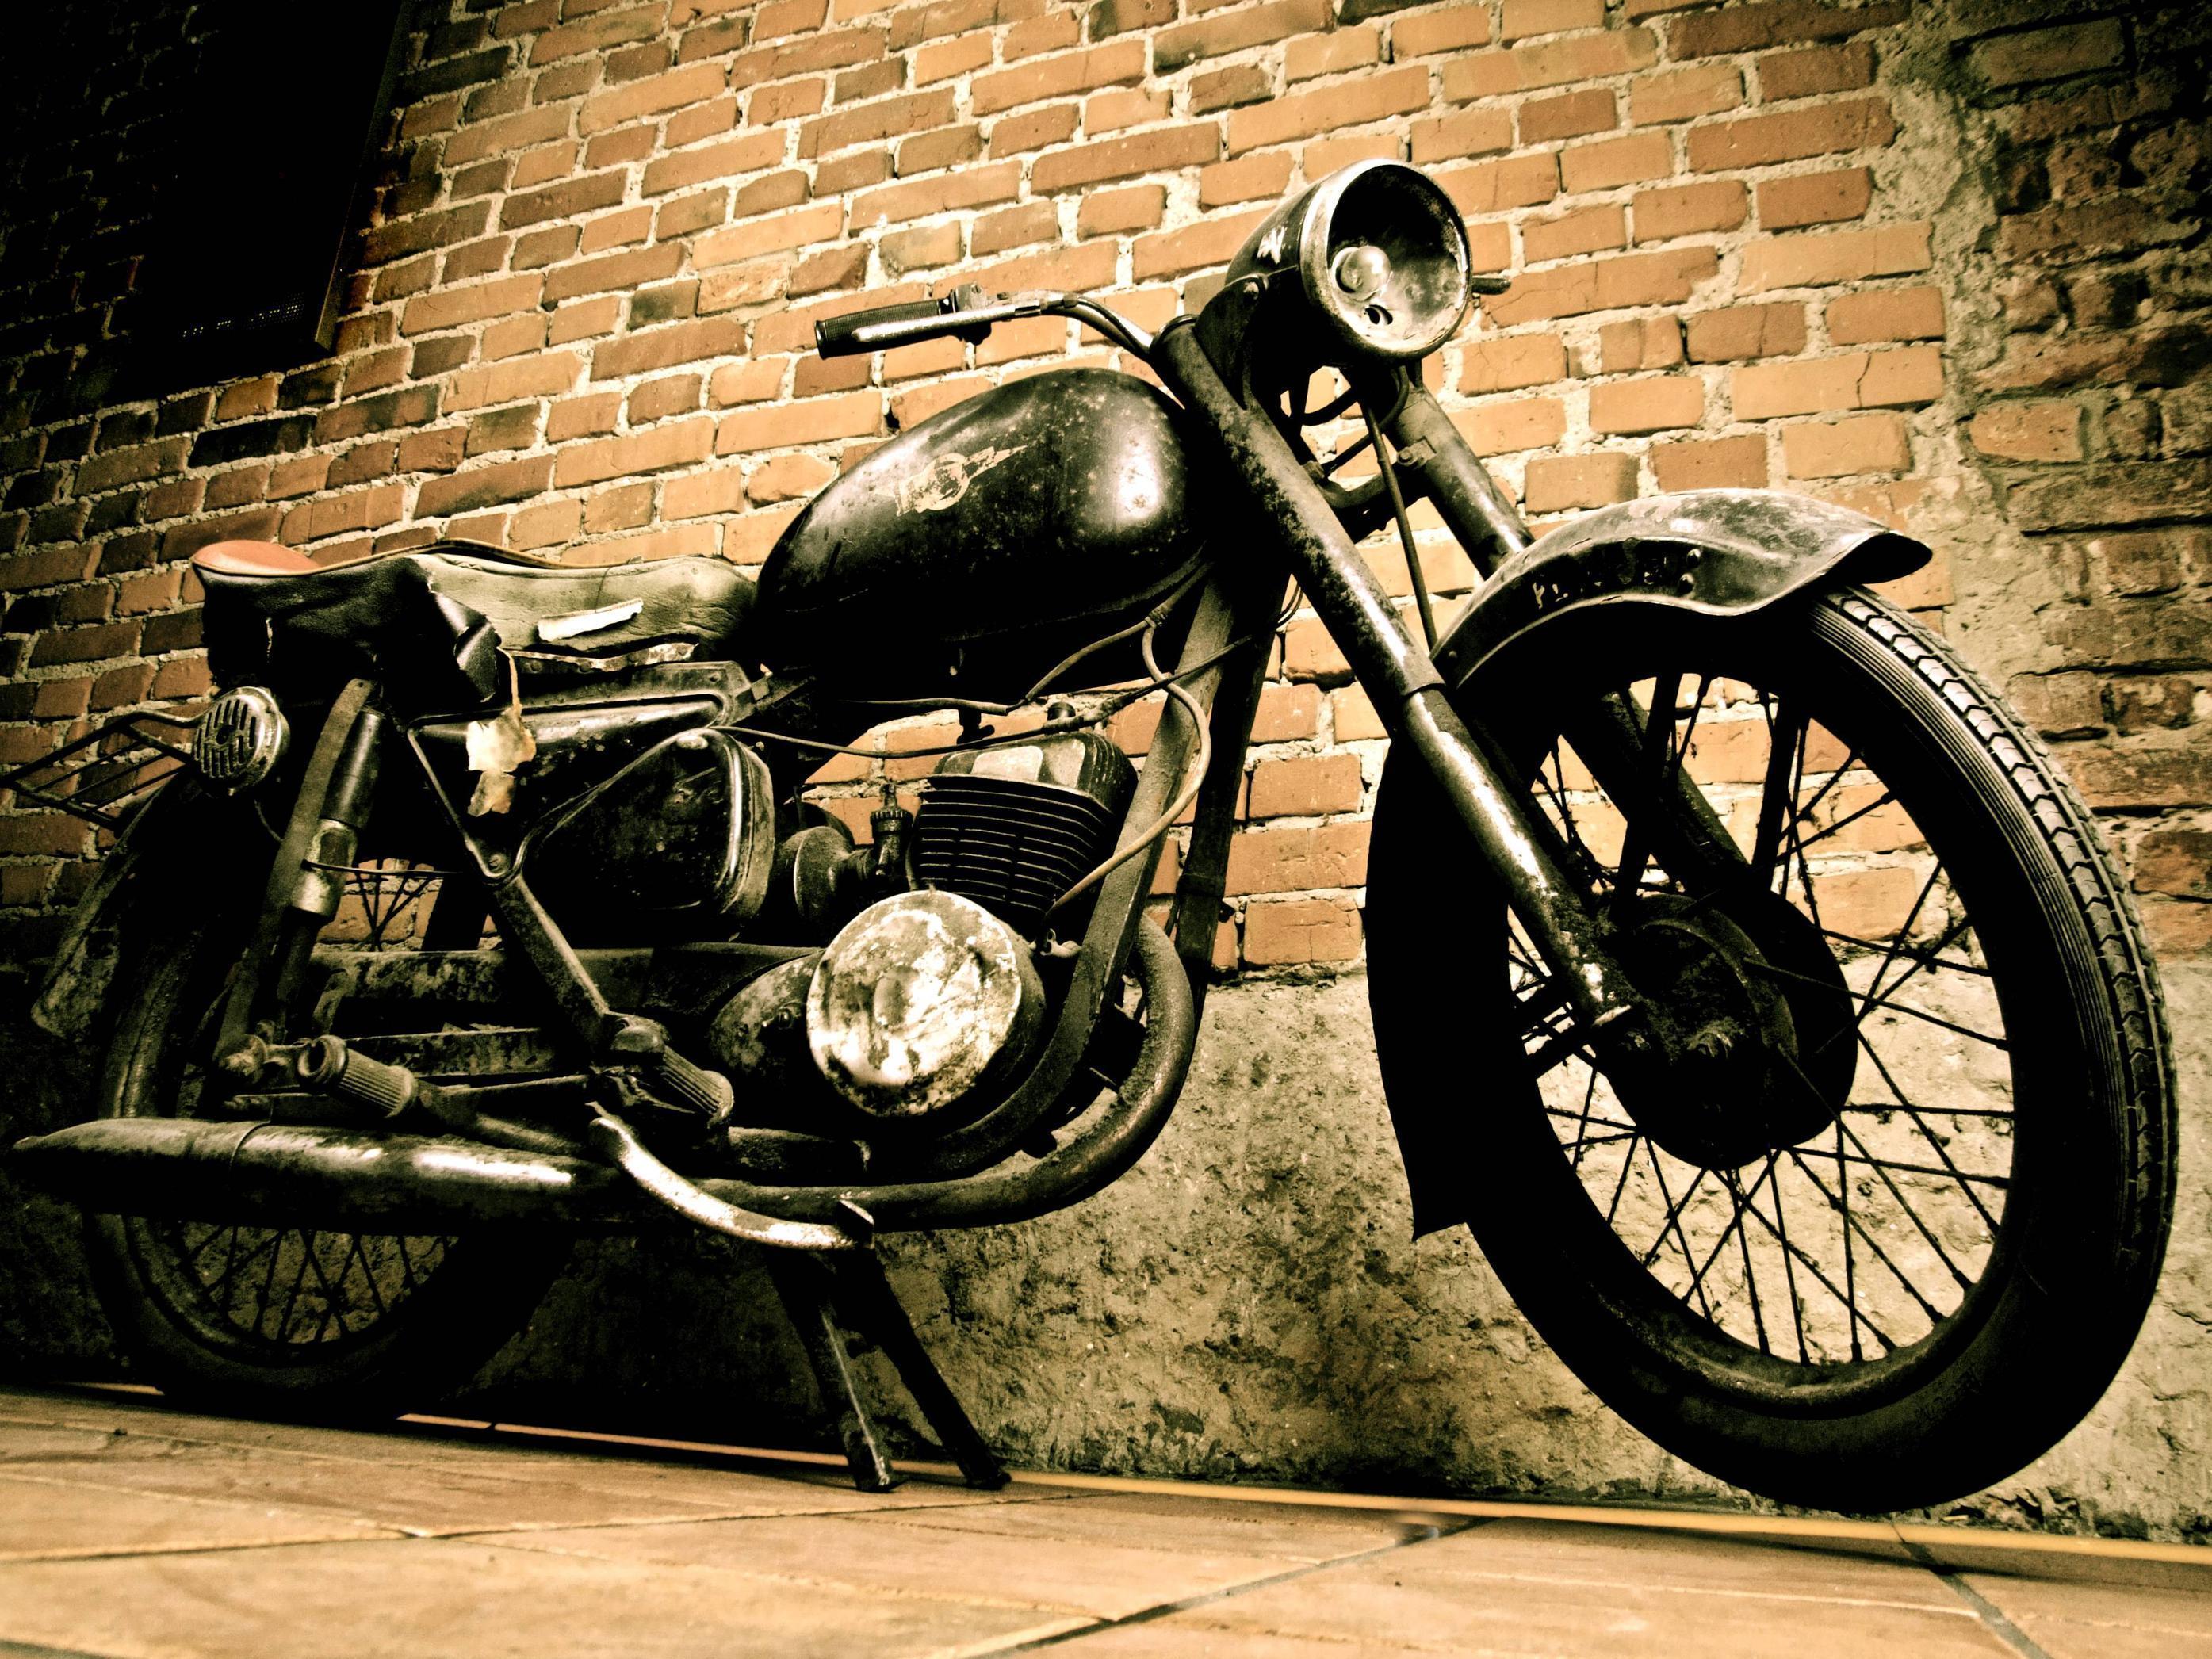 Vintage Motorcycle Wallpapers  Wallpaper Cave